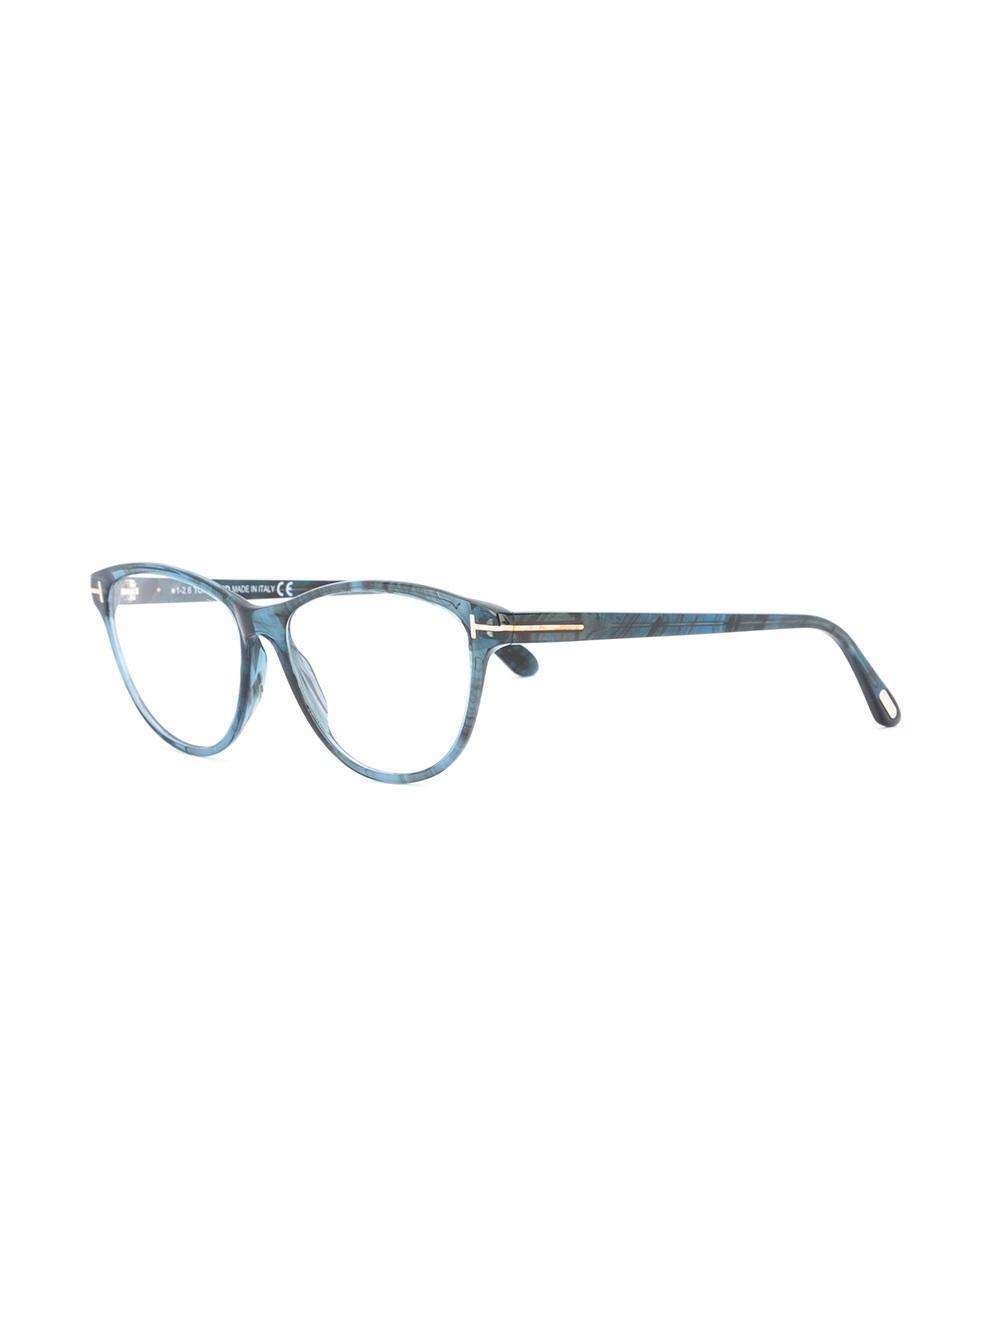 Mirrored Cat Eye Sunglasses Tom Ford